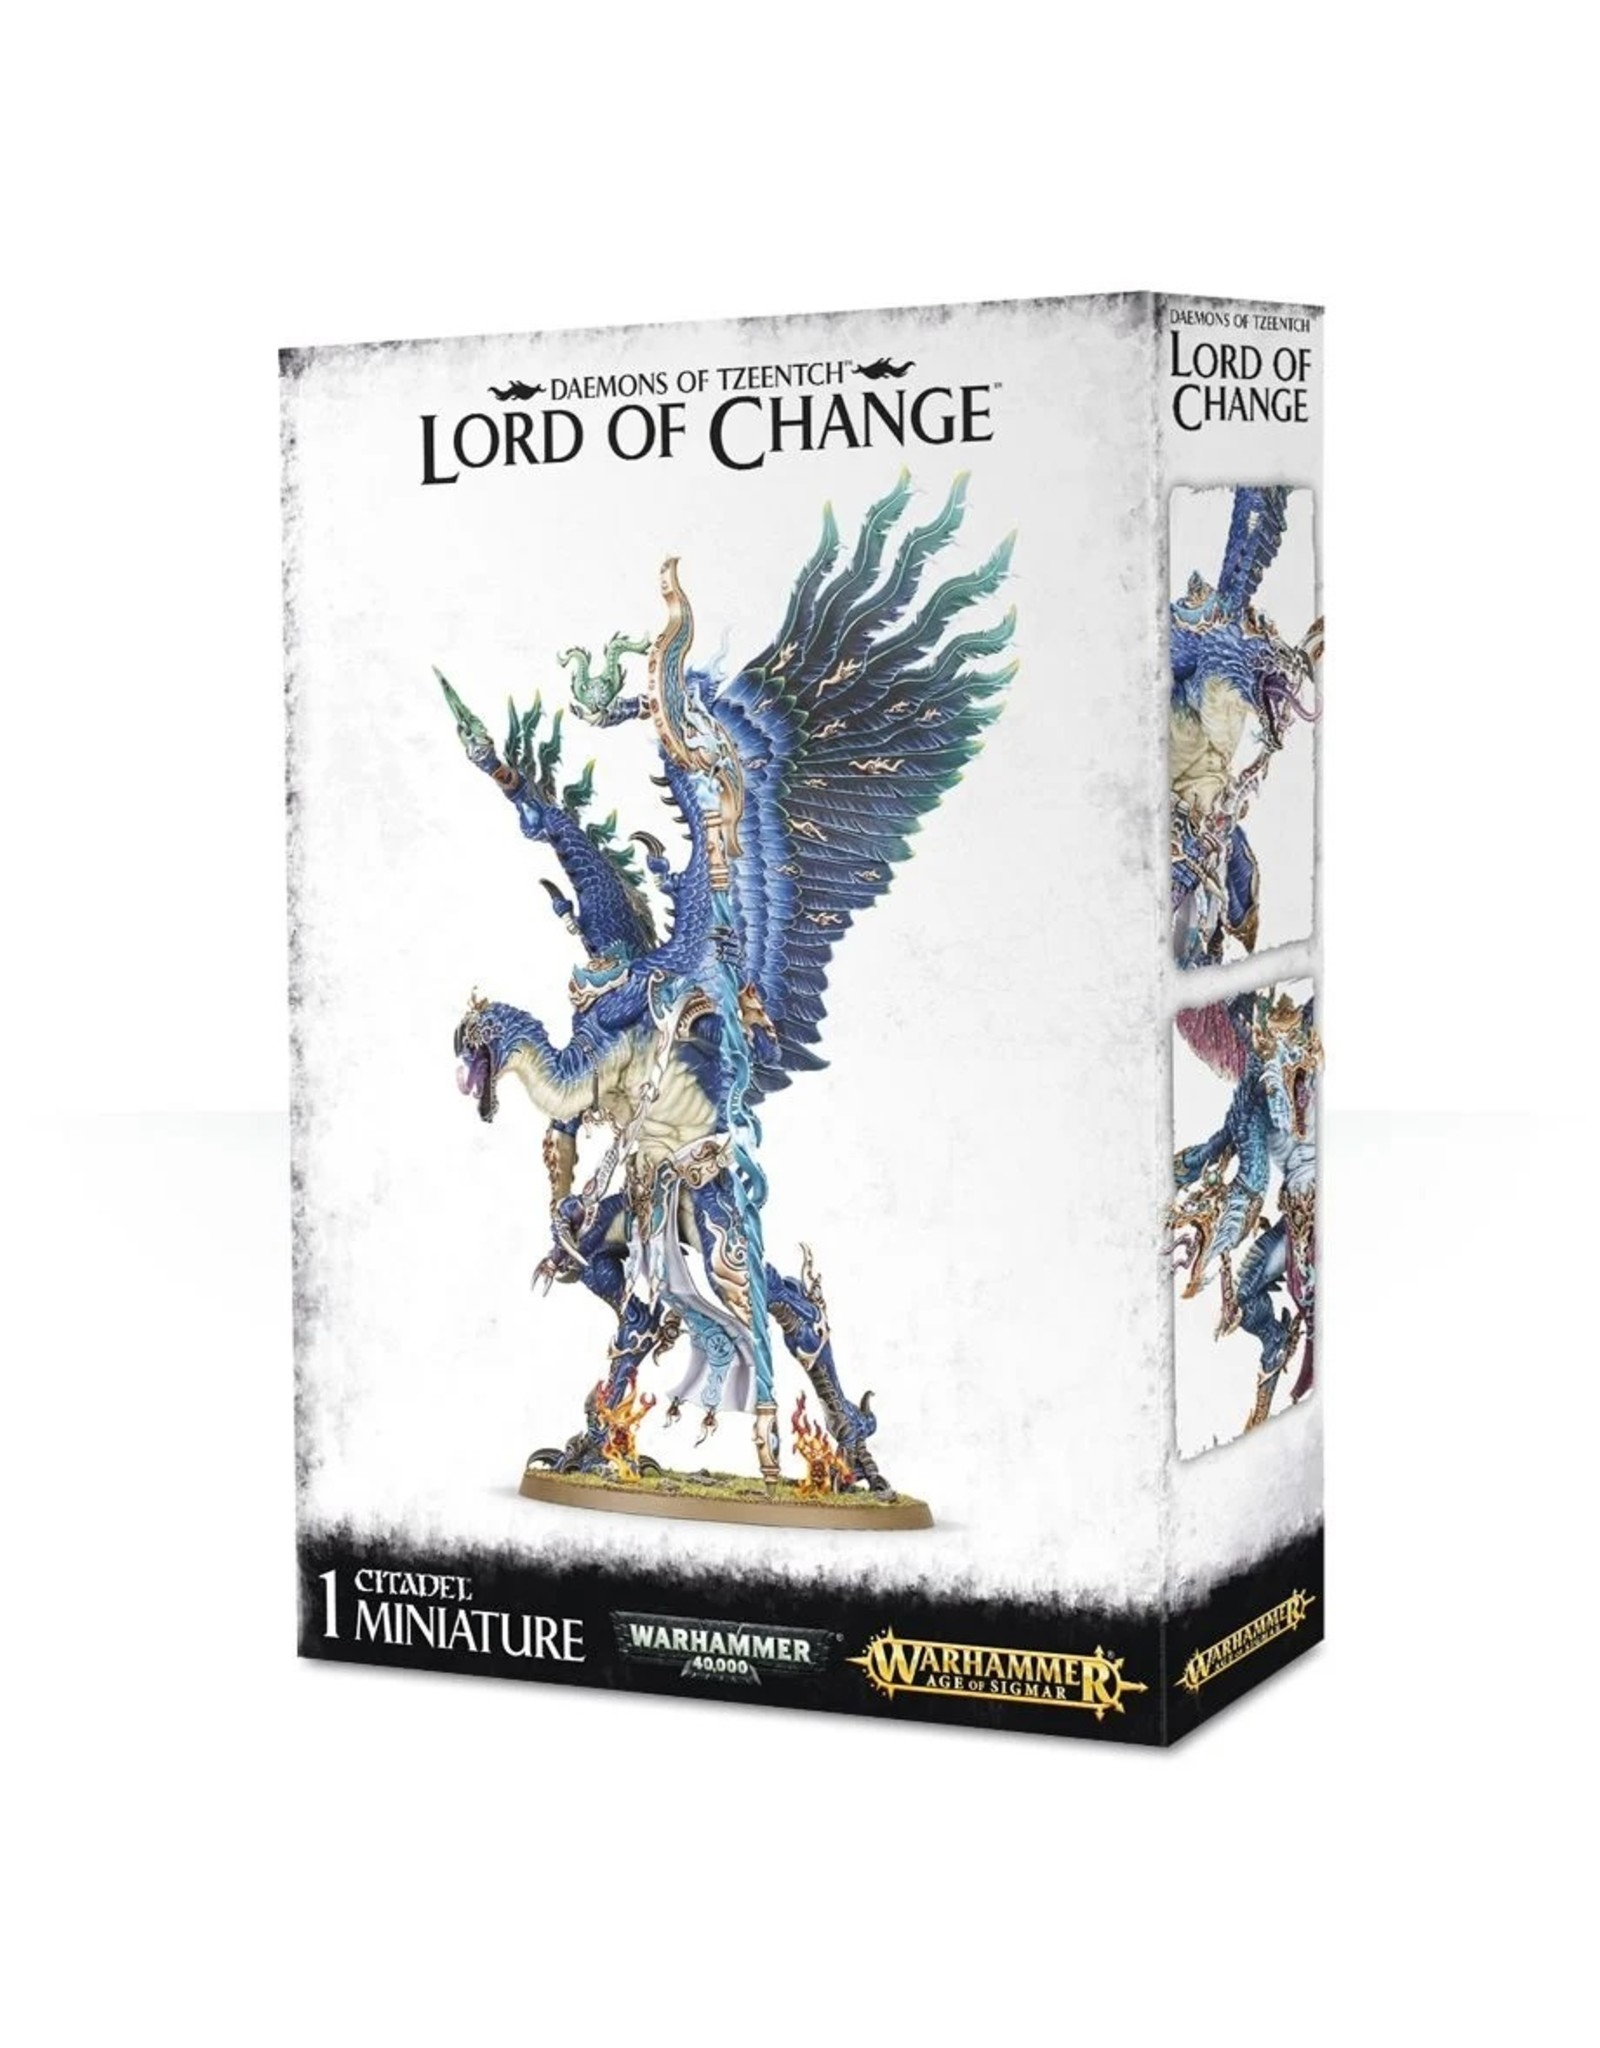 Games Workshop Daemons of Tzeentch: Lord of Change